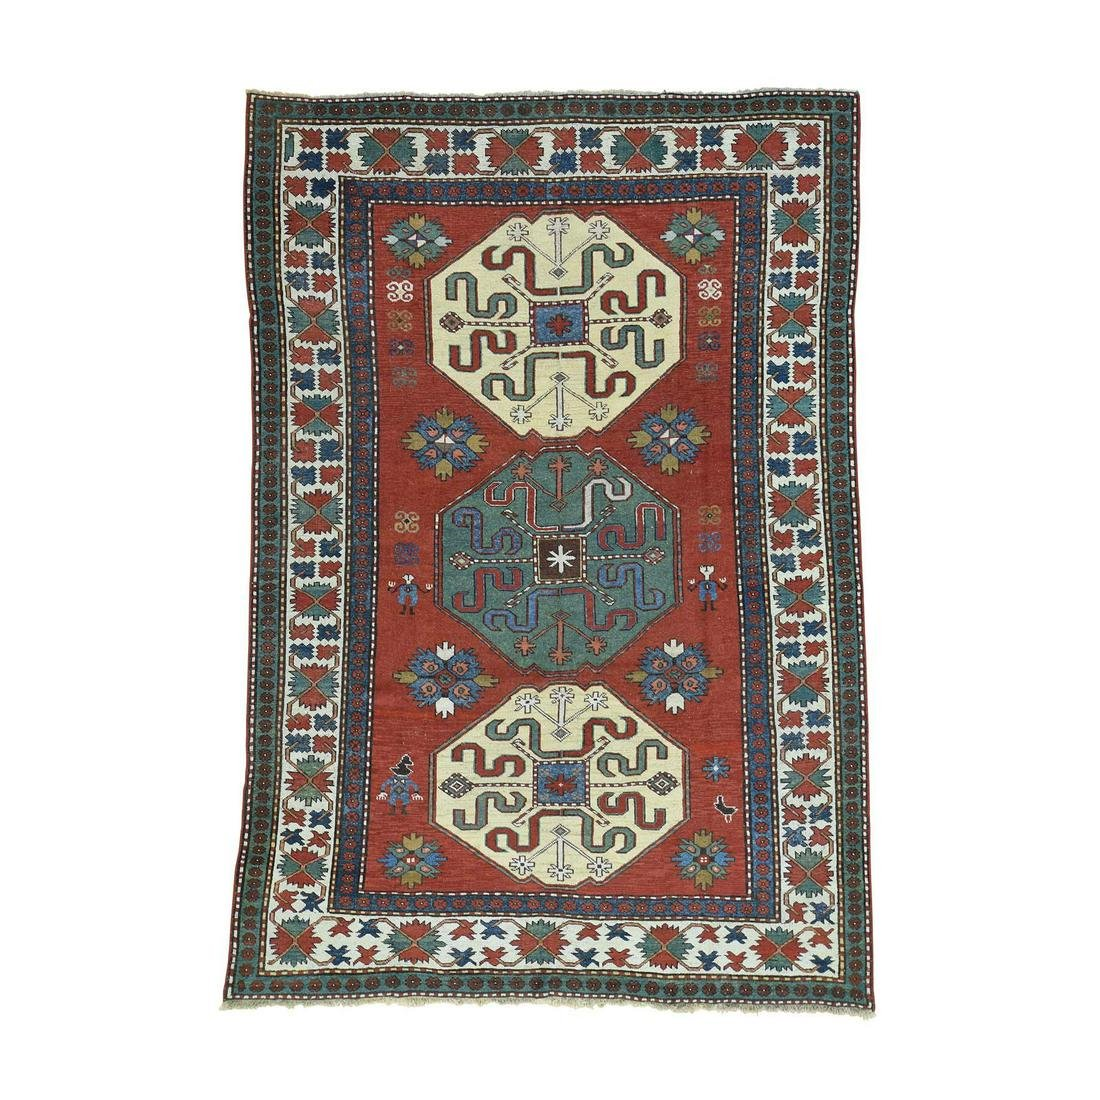 Antique Kazak Exc Cond 100 Percent Wool Oriental Rug